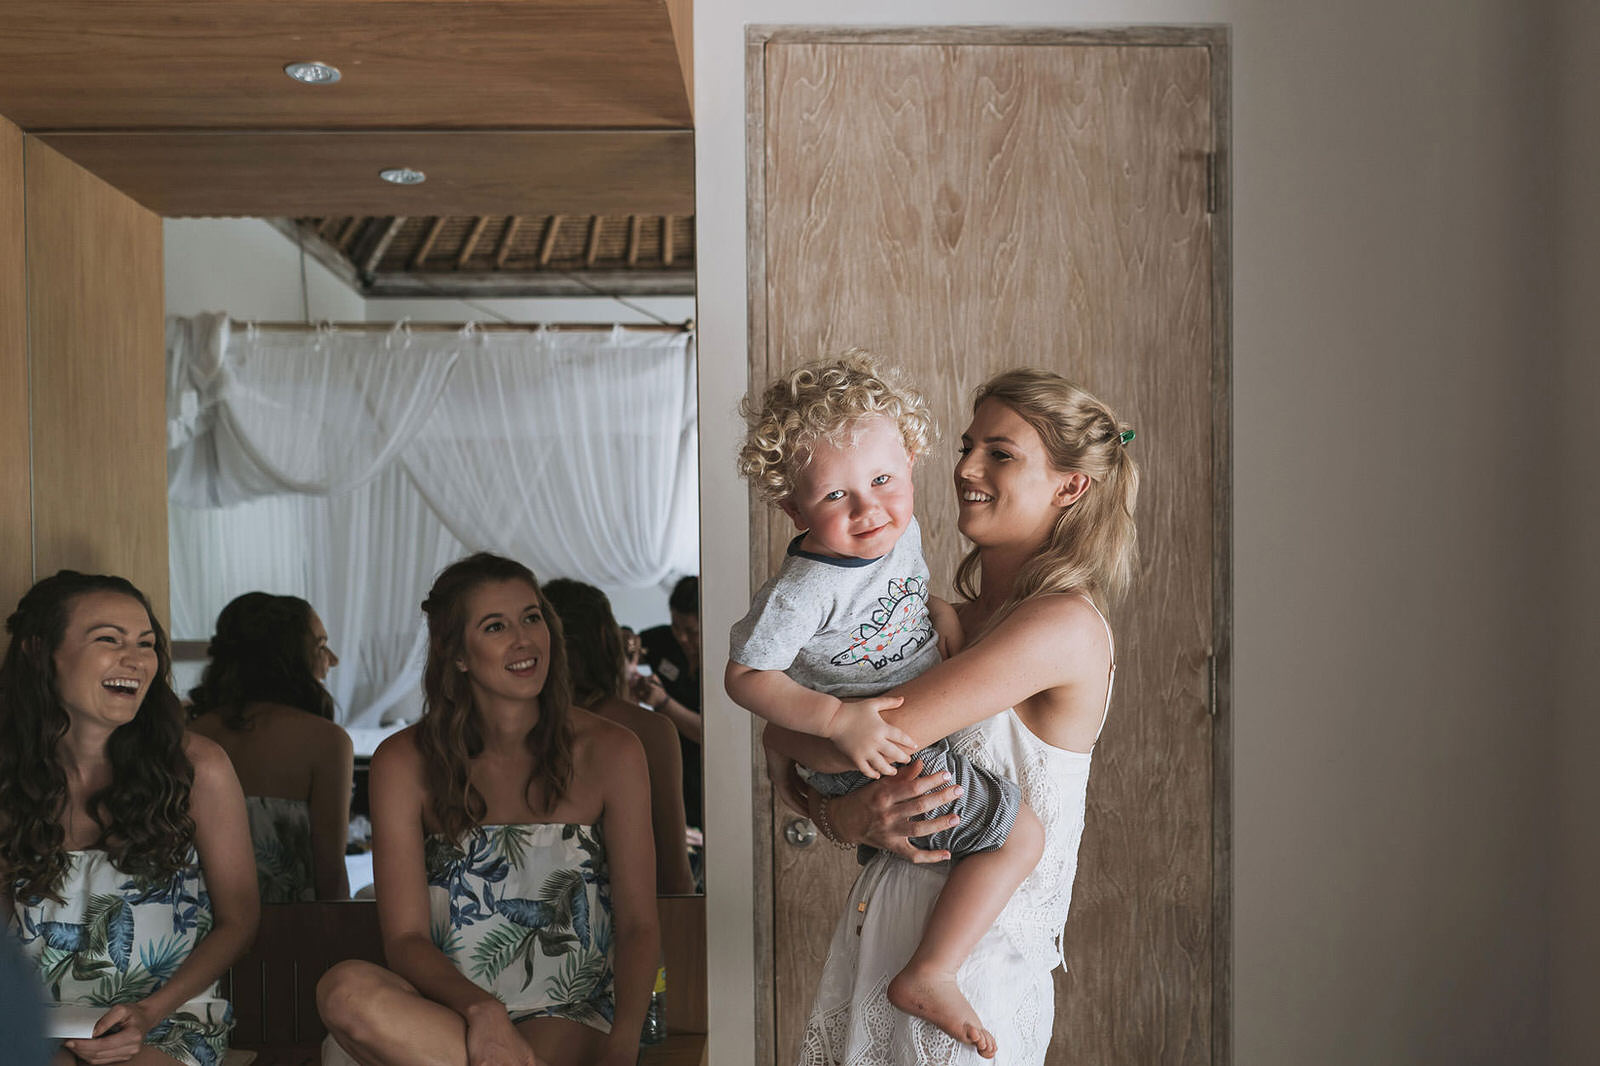 newfound-hai-tide-nusa-lembongan-bali-wedding-photographers-042